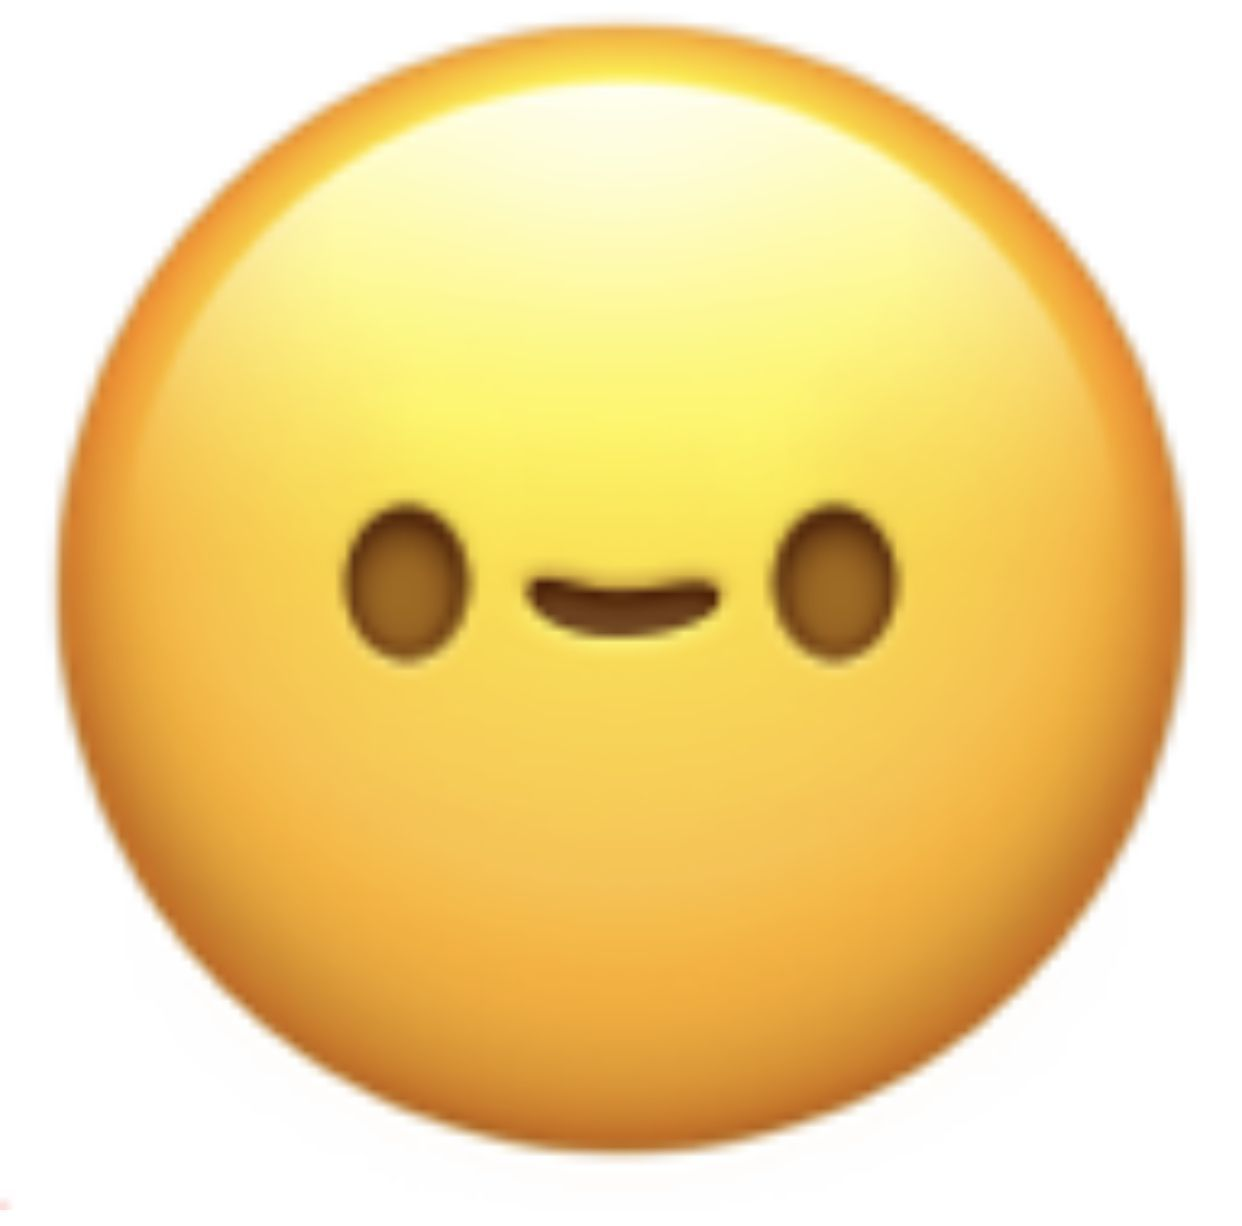 The Book Of Cursed Emojis Reaction Emojis In 2020 Cute Memes Cute Love Memes Cartoon Memes